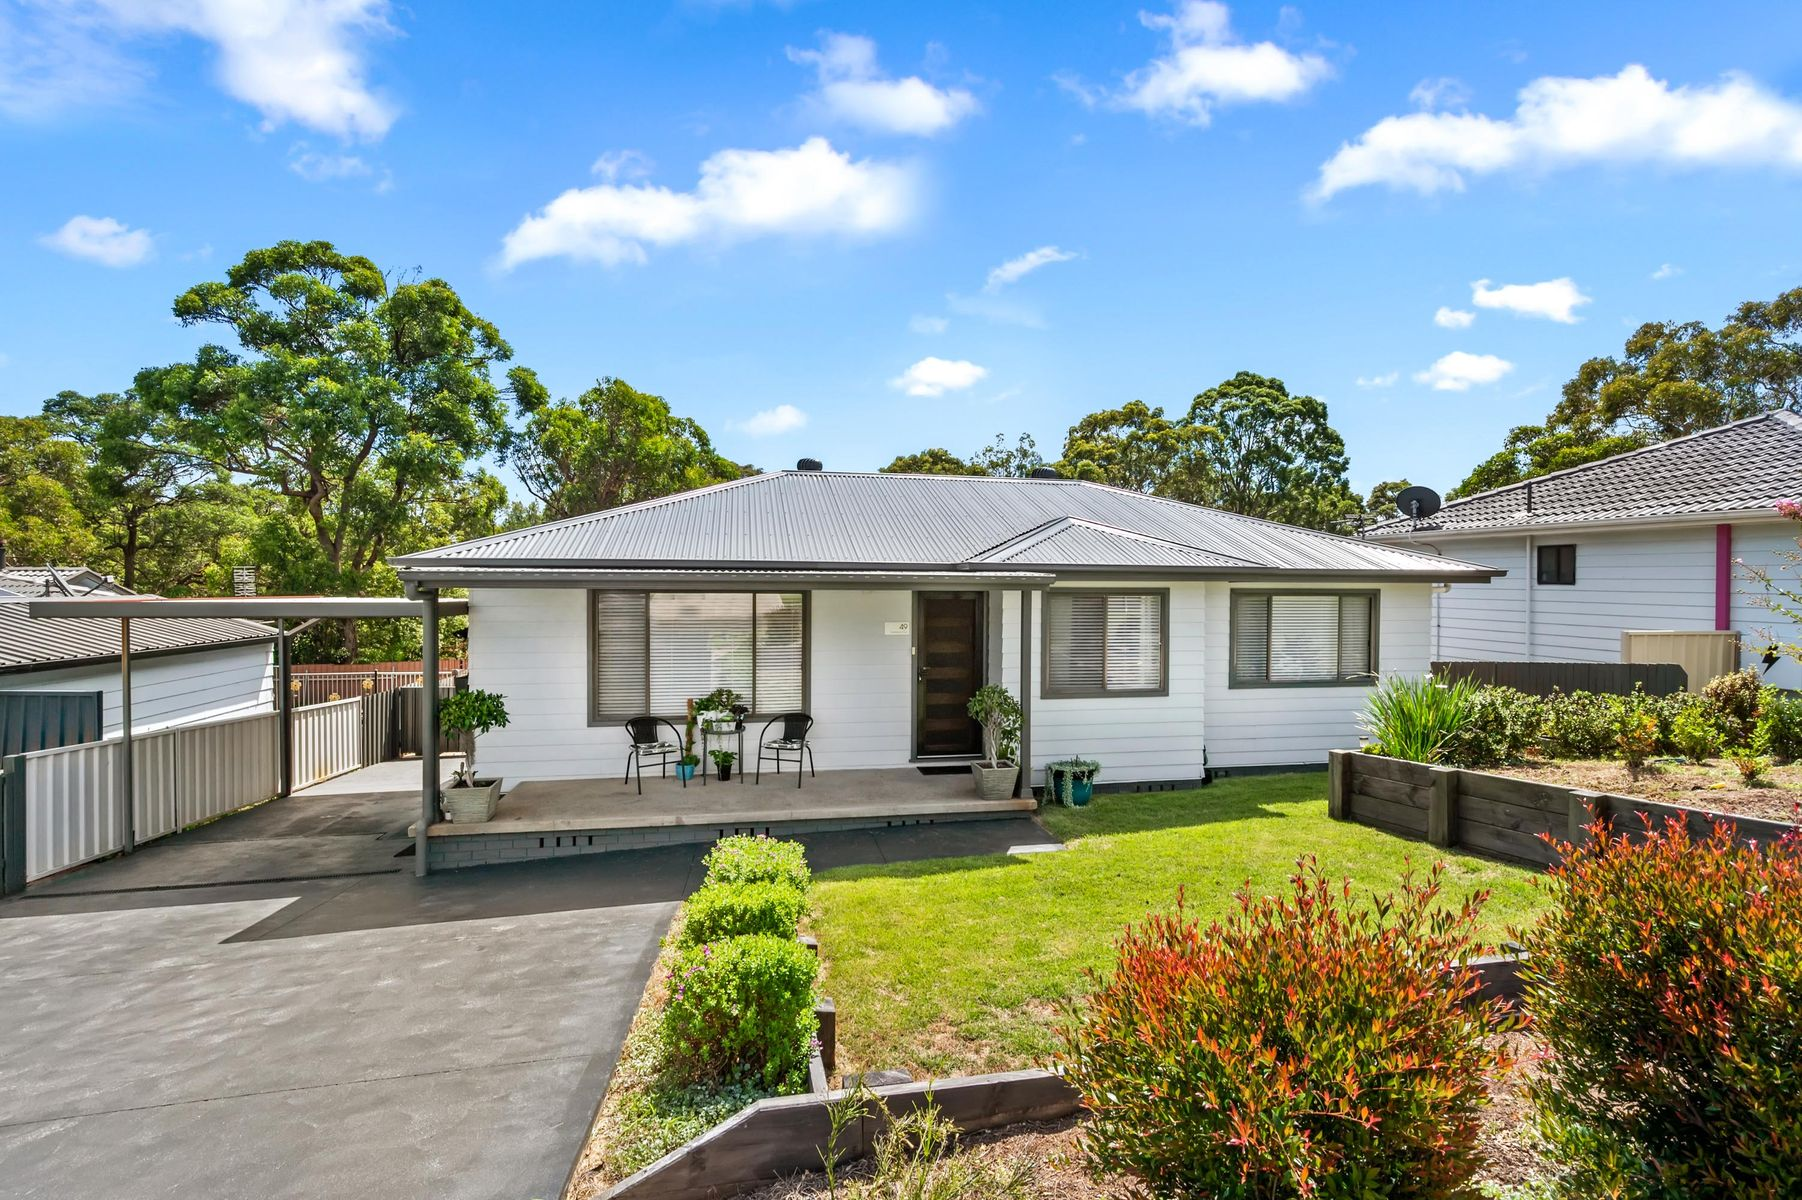 49 Haddington Drive, Cardiff South, NSW 2285